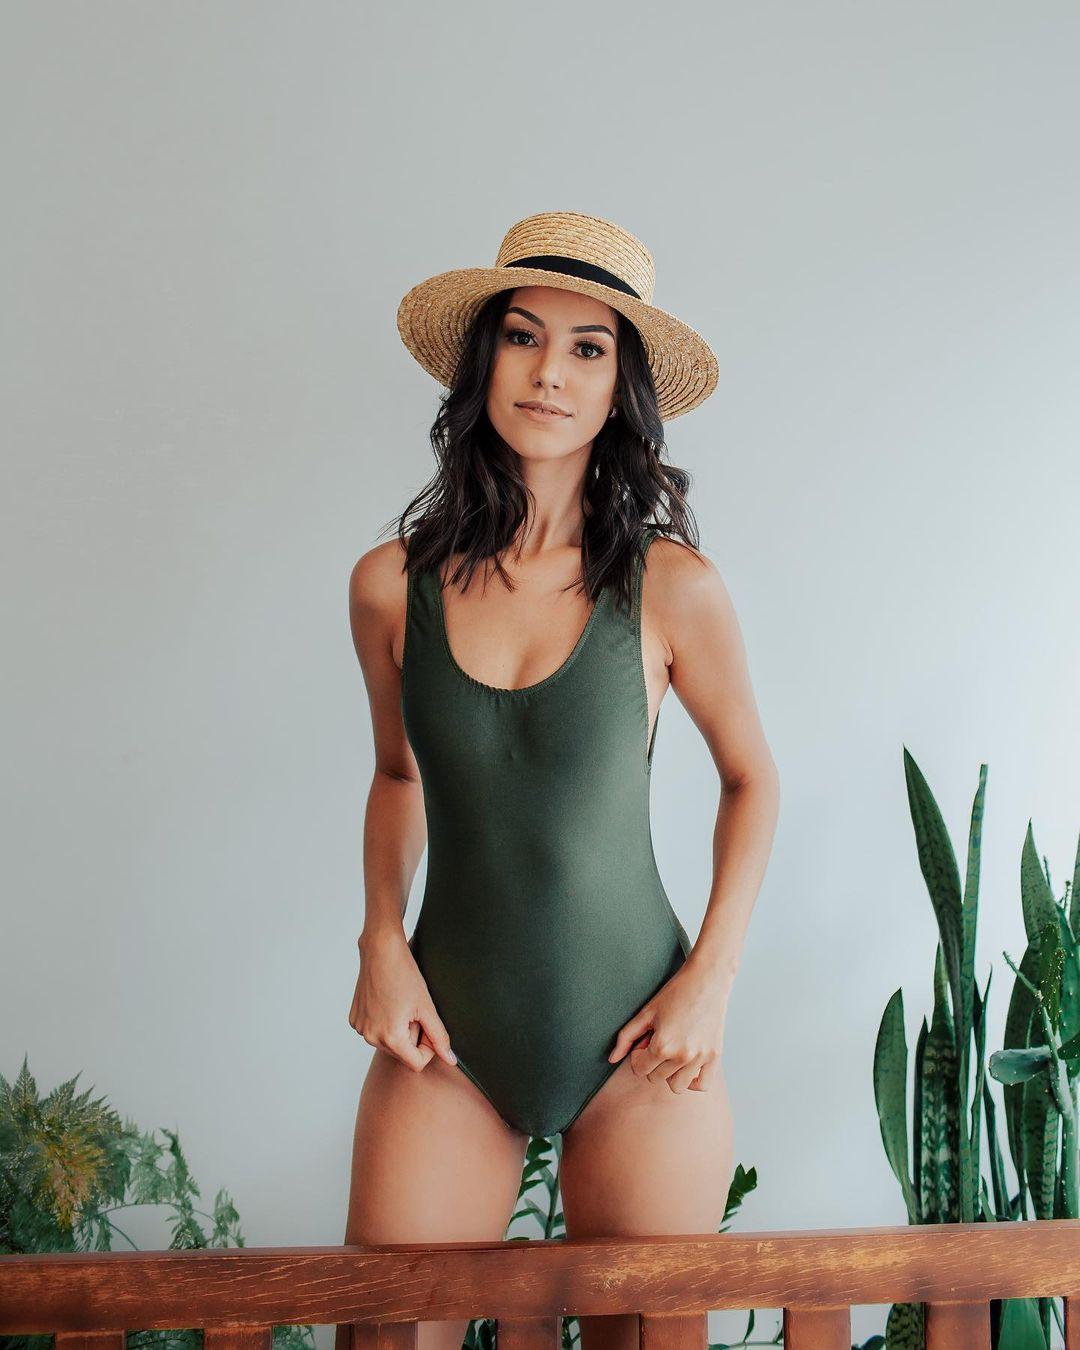 rafaella felipe, top 20 de miss brasil mundo 2019. - Página 2 Qlbkts10